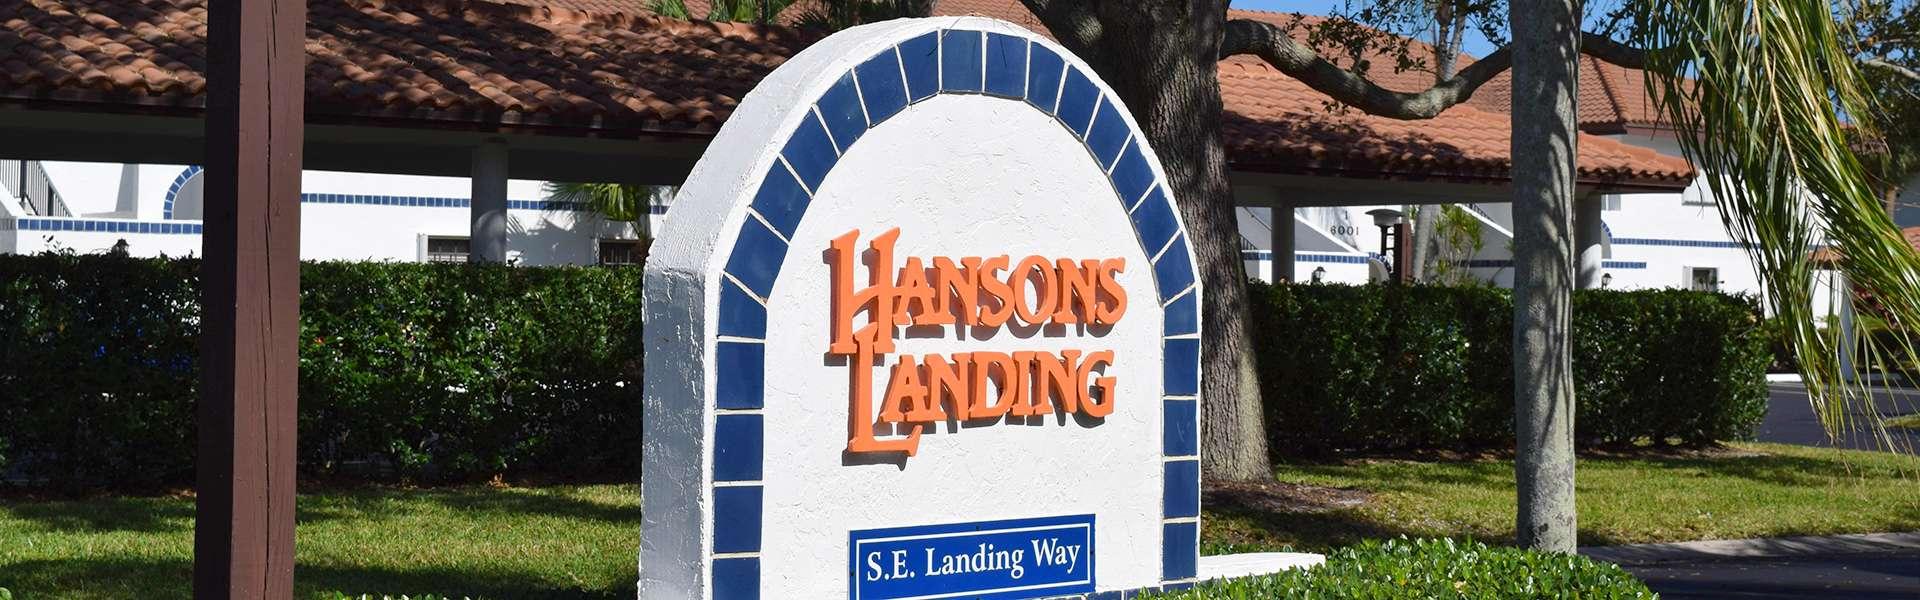 Hanson's Landing